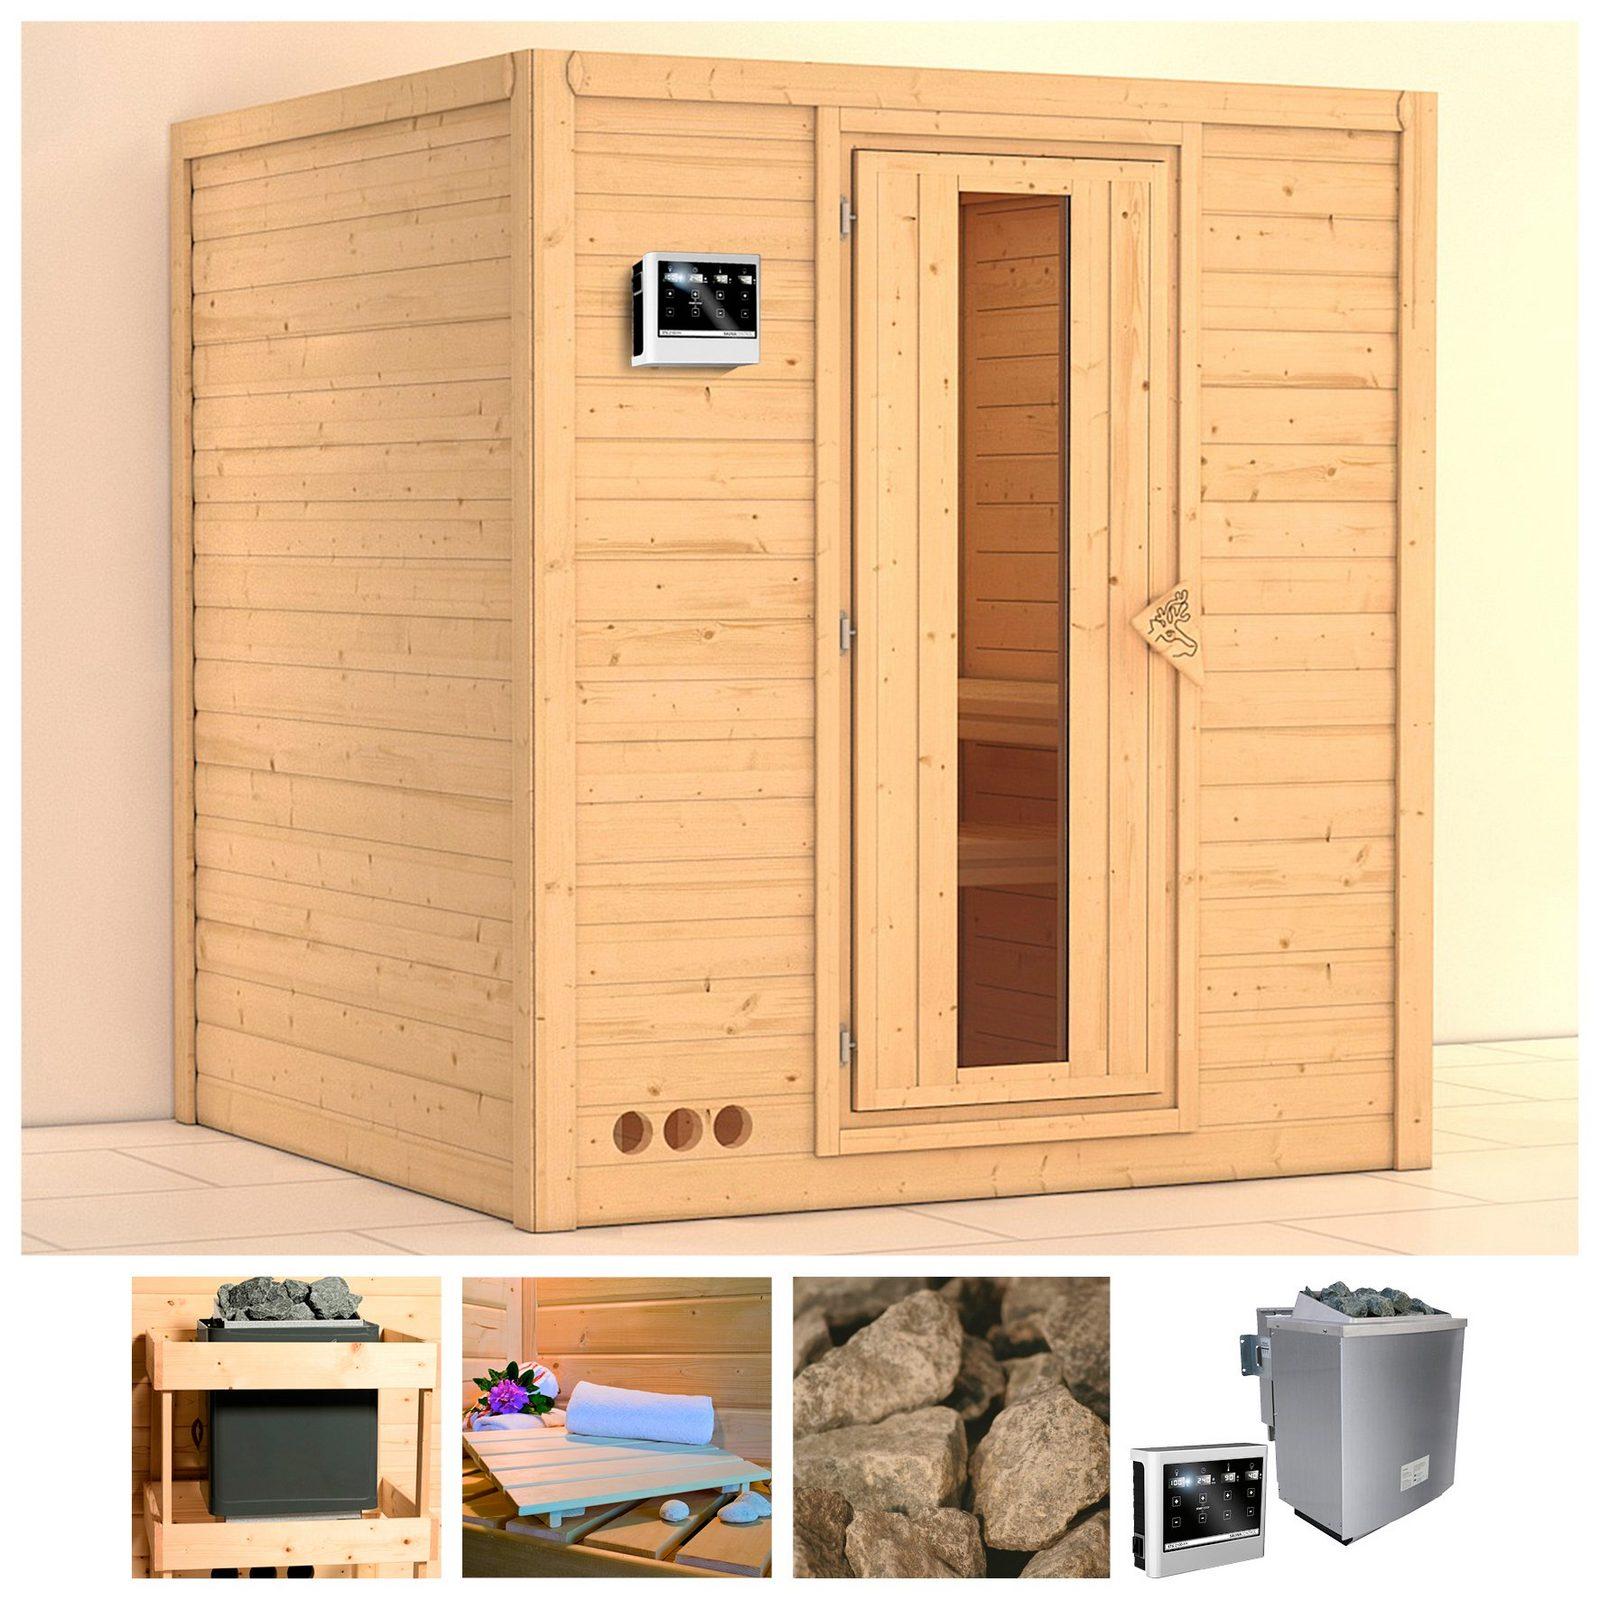 KARIBU Sauna »Mojave«, 193/184/209 cm, 9-kW-Bio-Ofen mit ext. Strg., Holztür